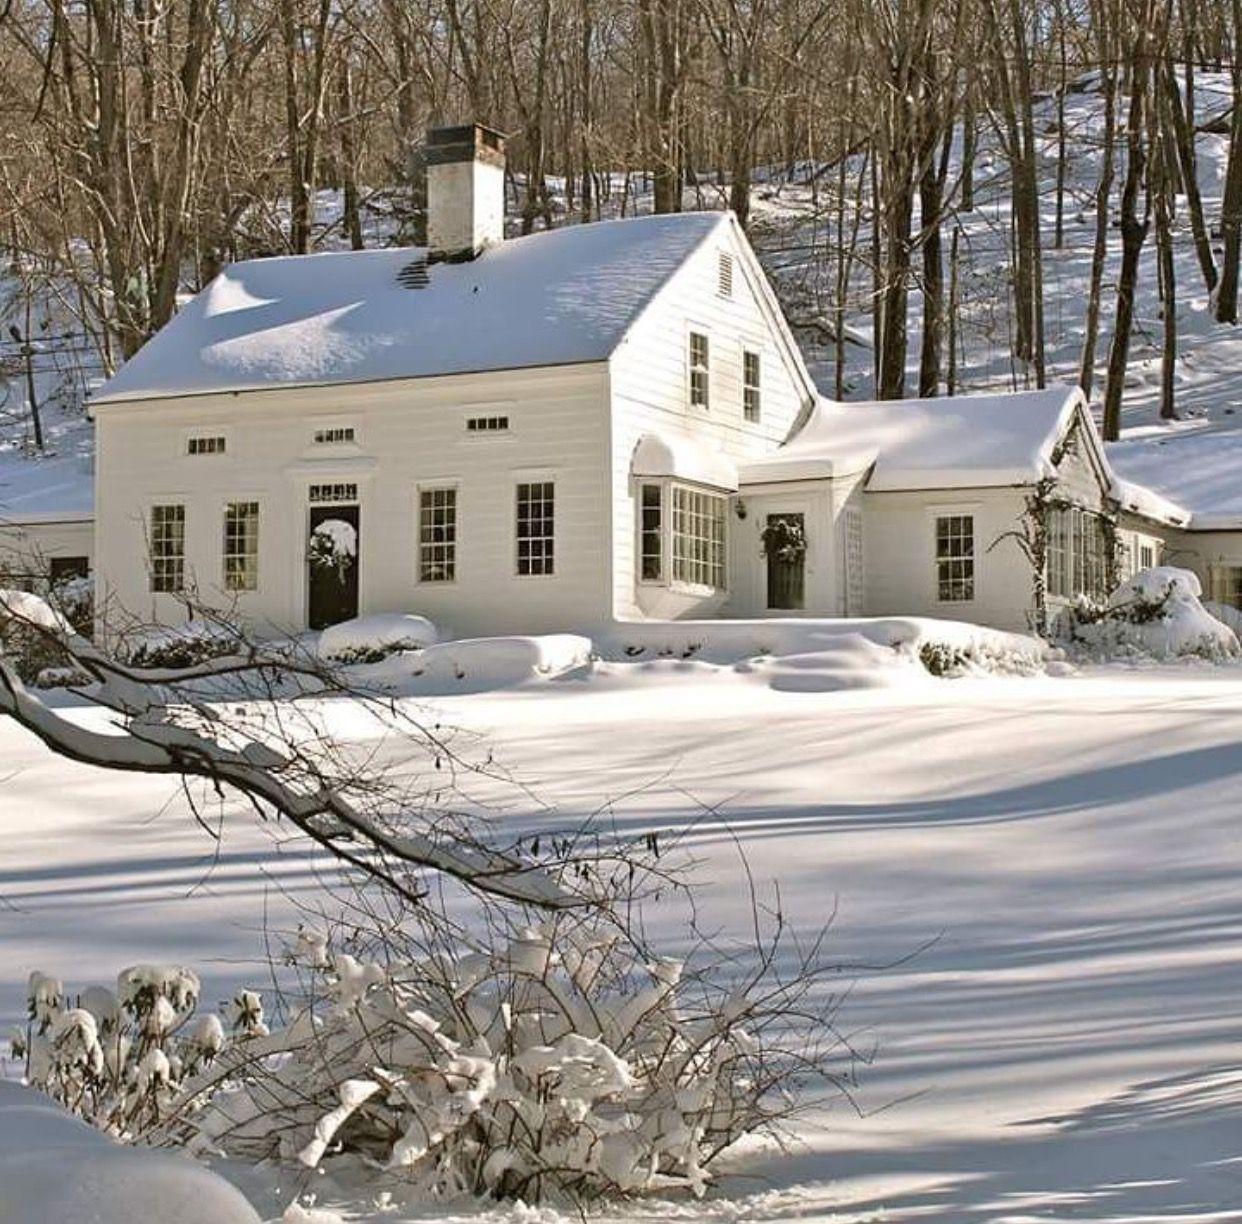 Dreamy winter life Dreamy winter life